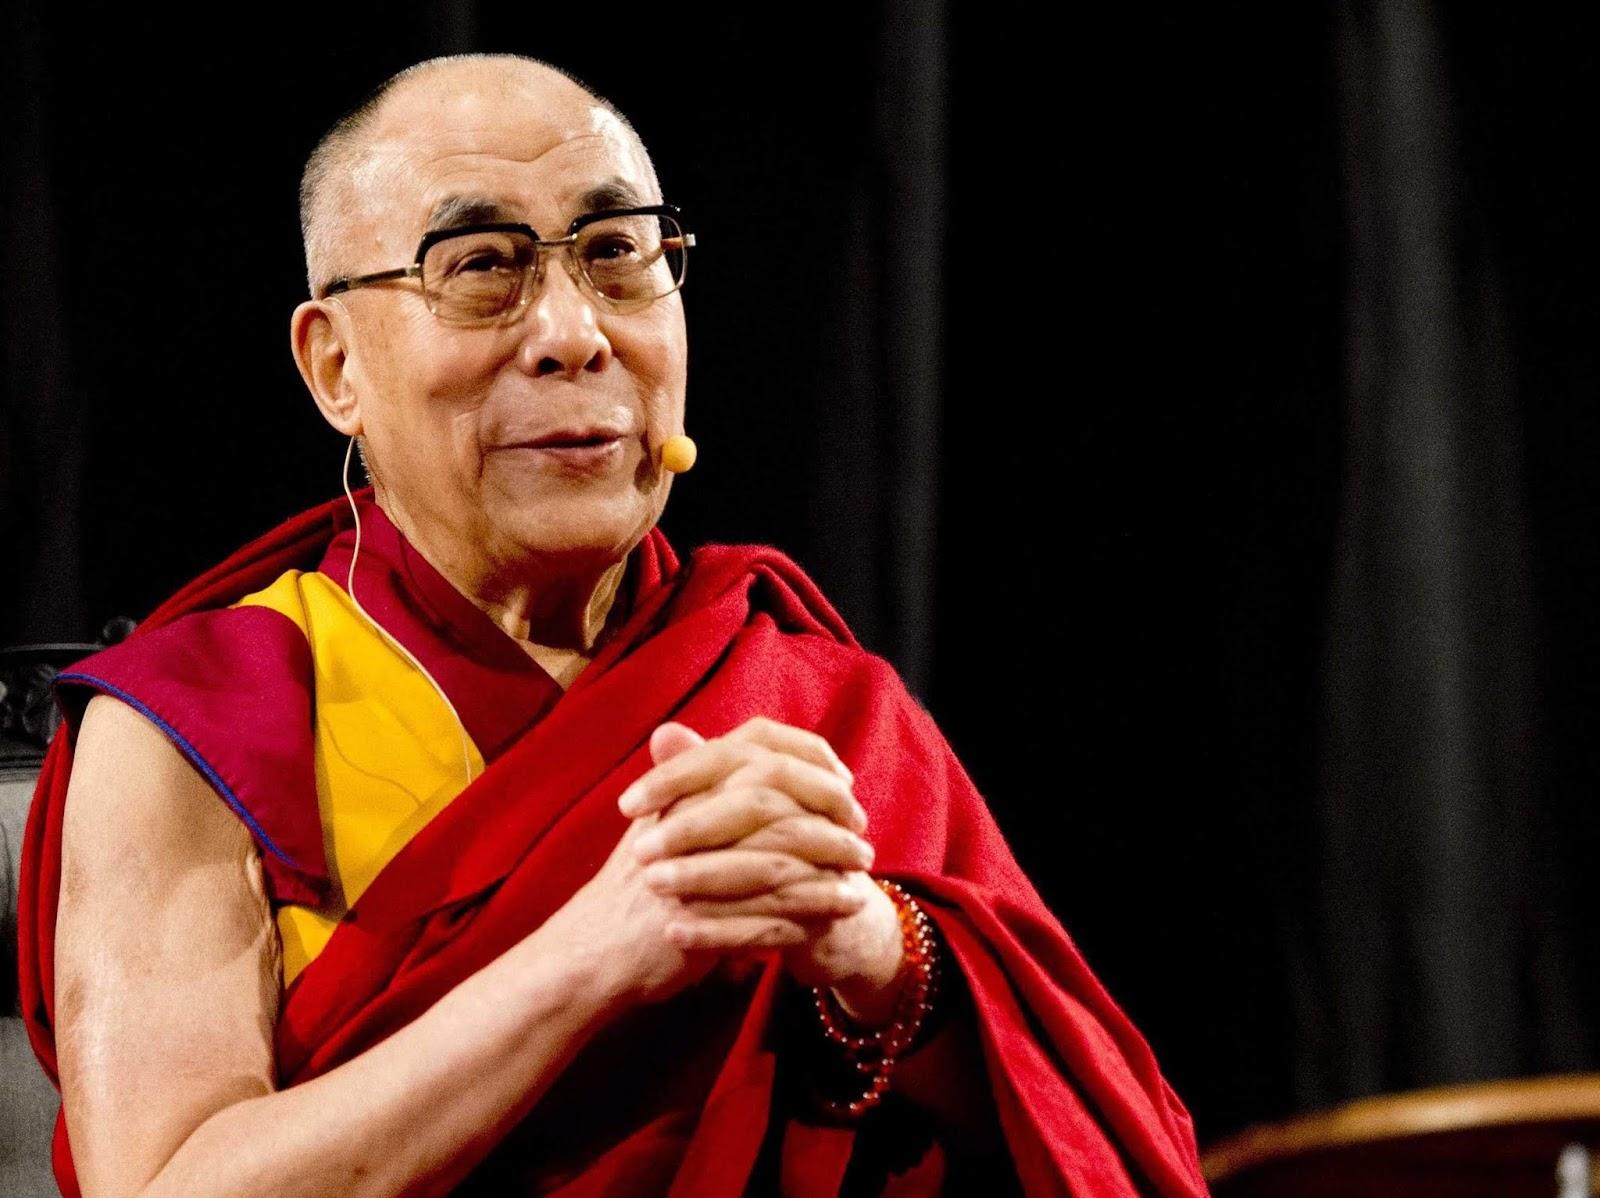 The Dalai Lama An Ambiguous Figure